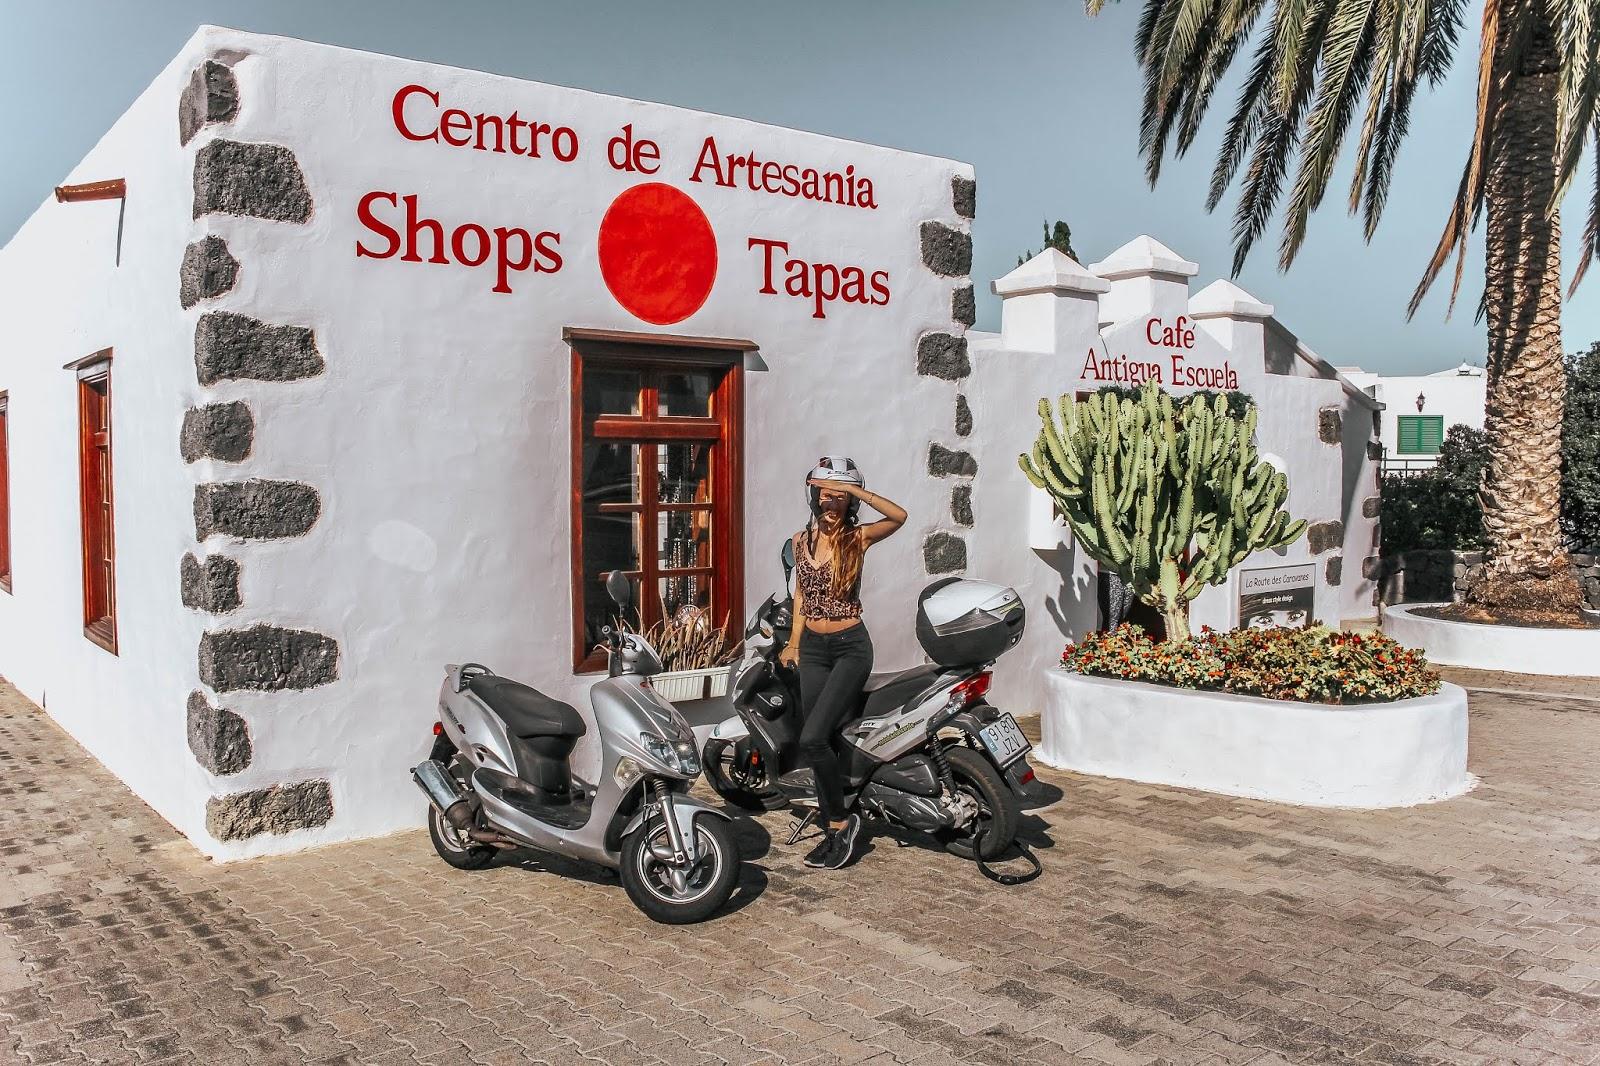 Lanzarote Cafe Antigua Escuela